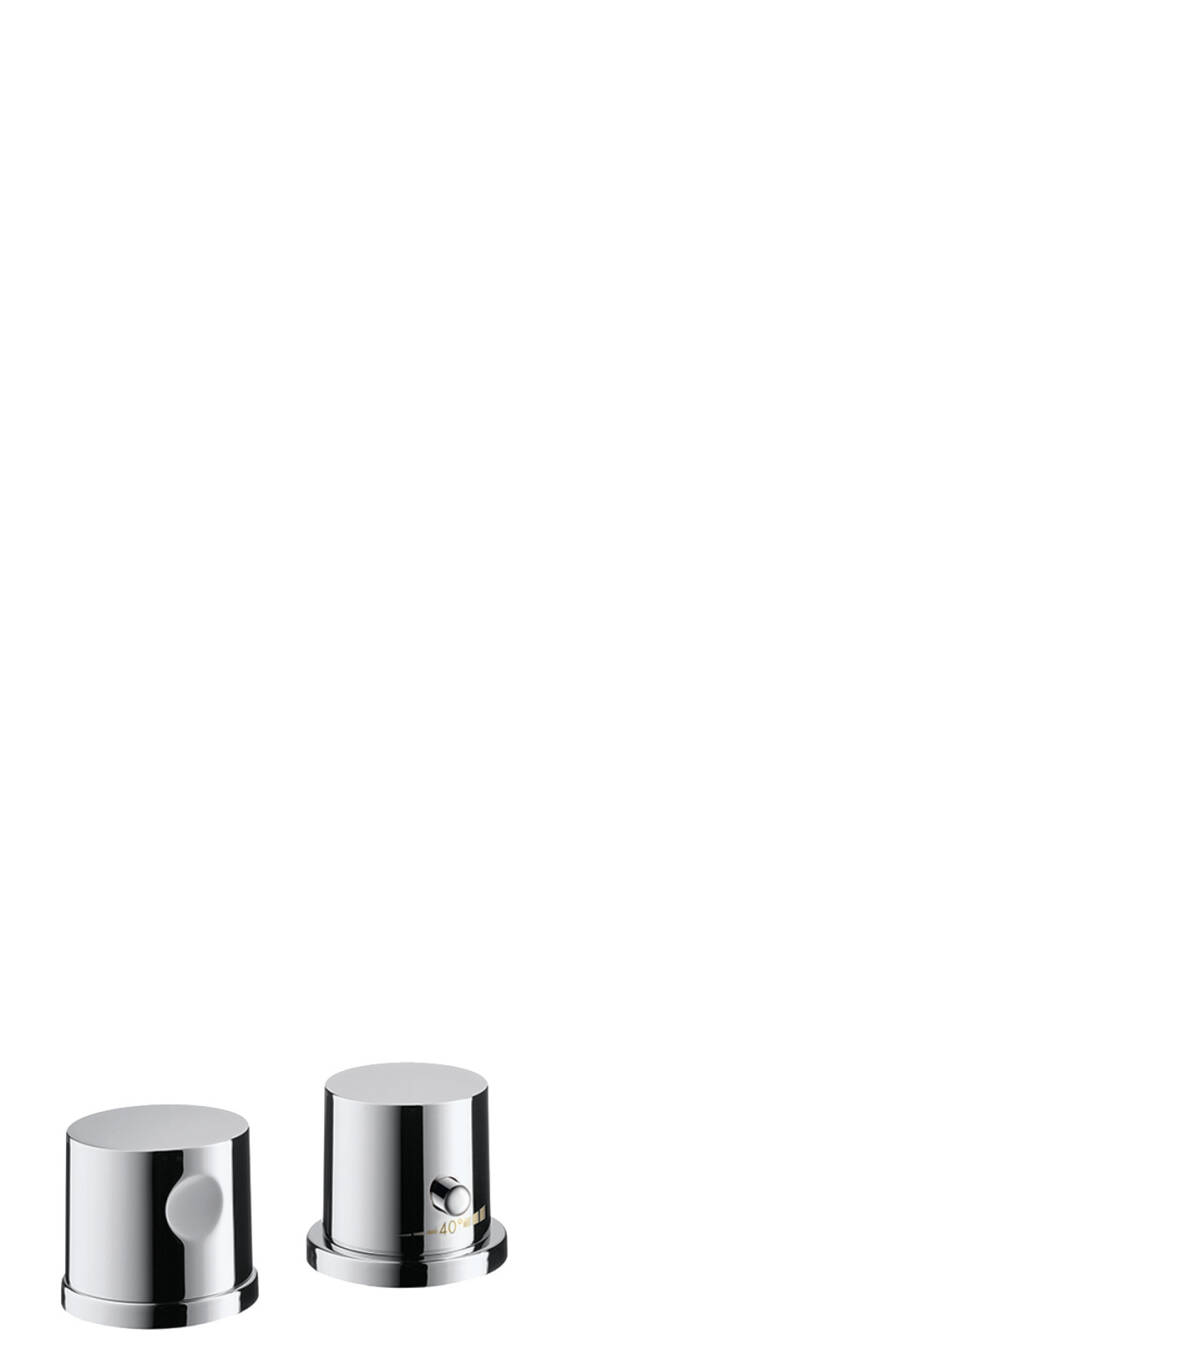 2-hole rim mounted thermostatic bath mixer, Chrome, 38480000